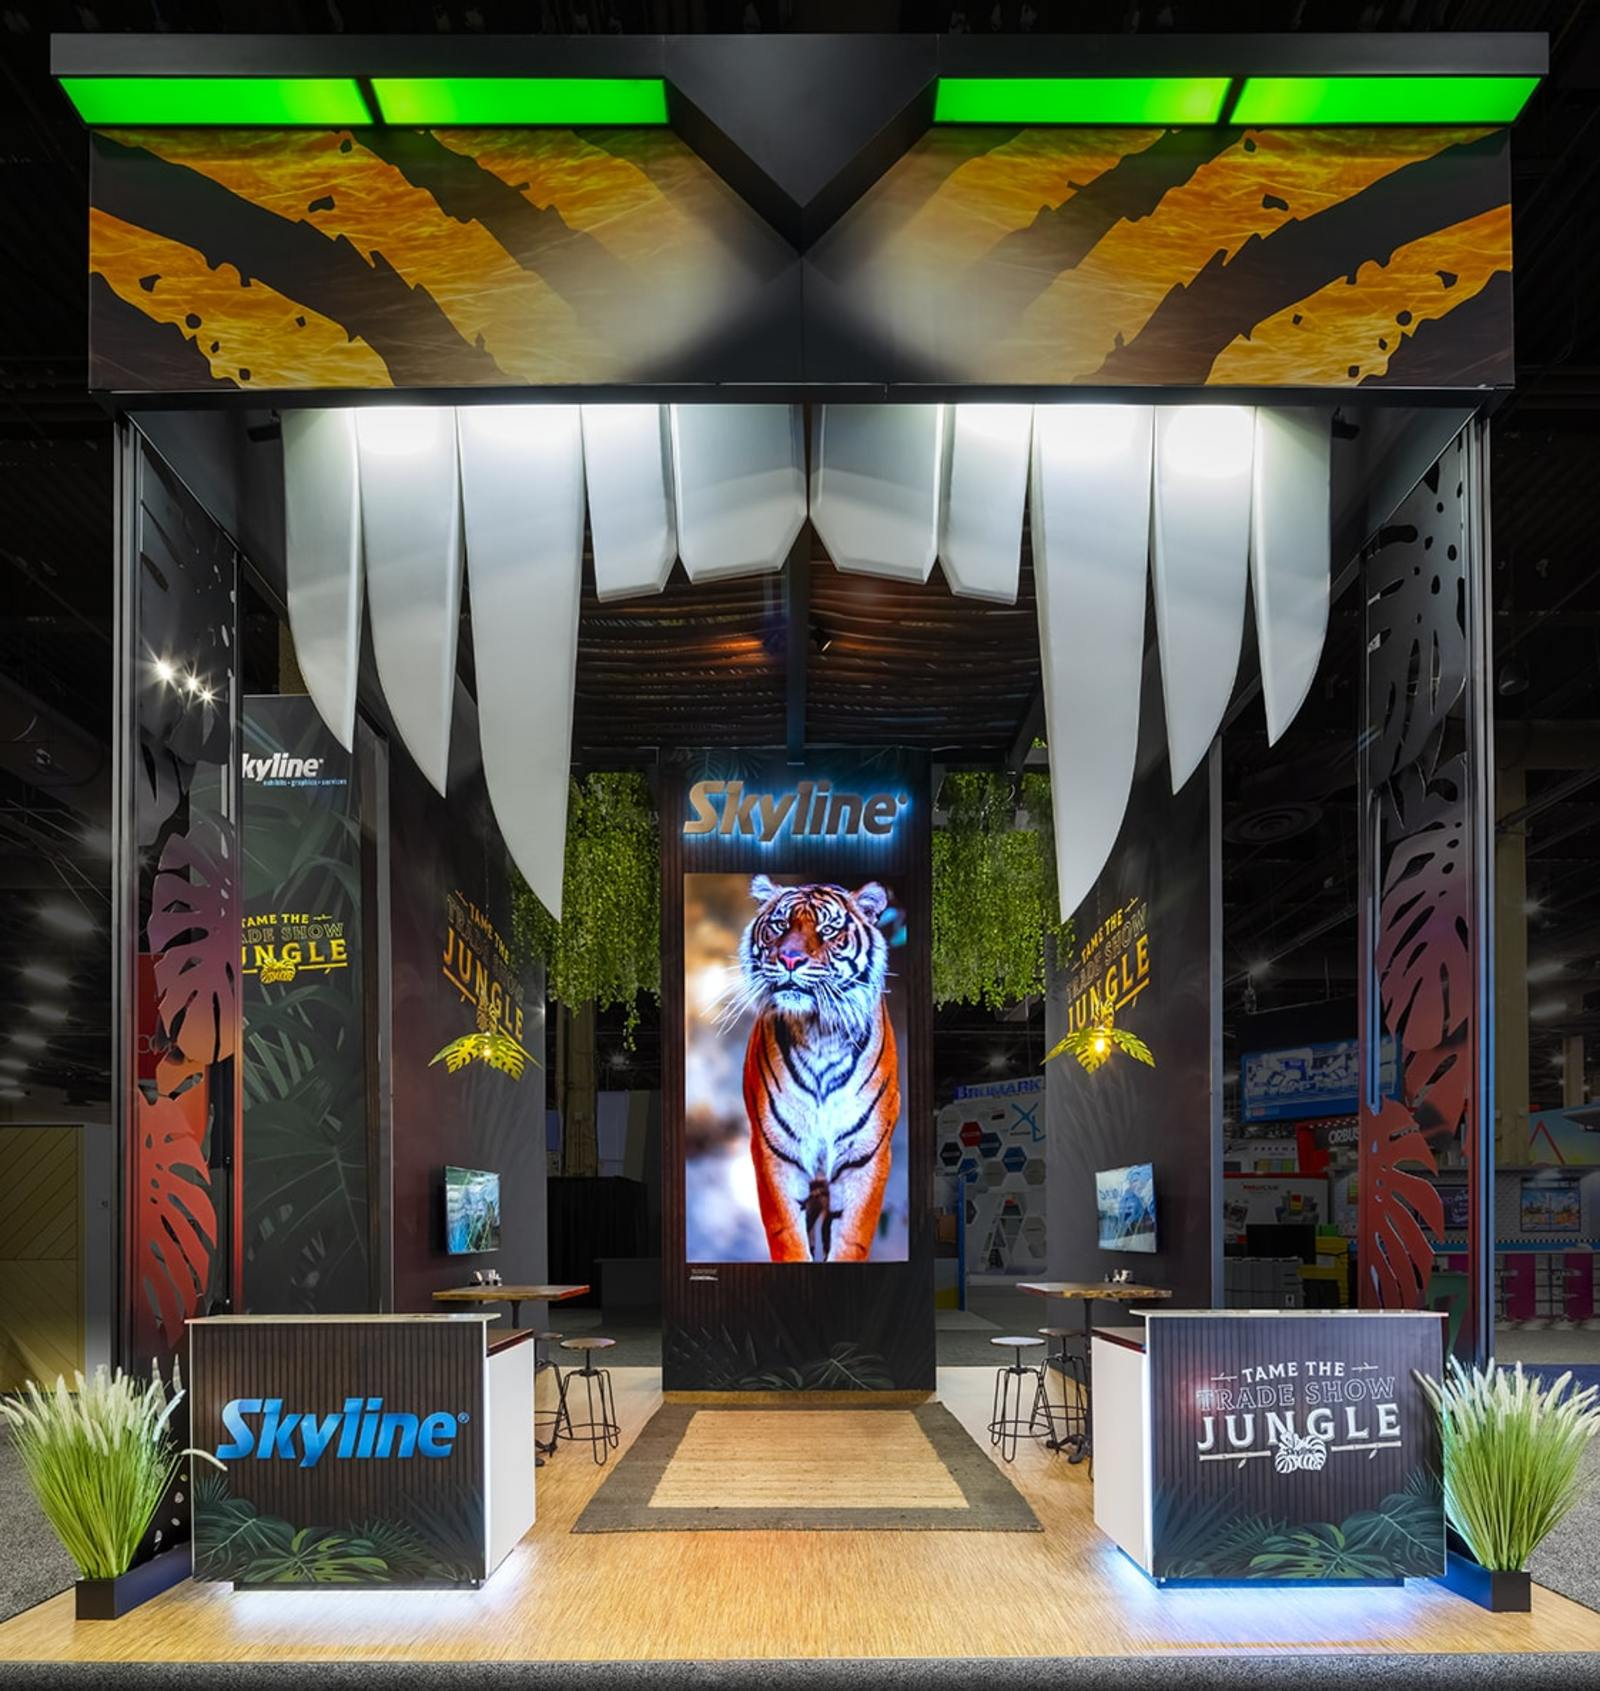 Exhibition Stand Design Ideas Website : Exhibit design ideas inspiration trade show displays